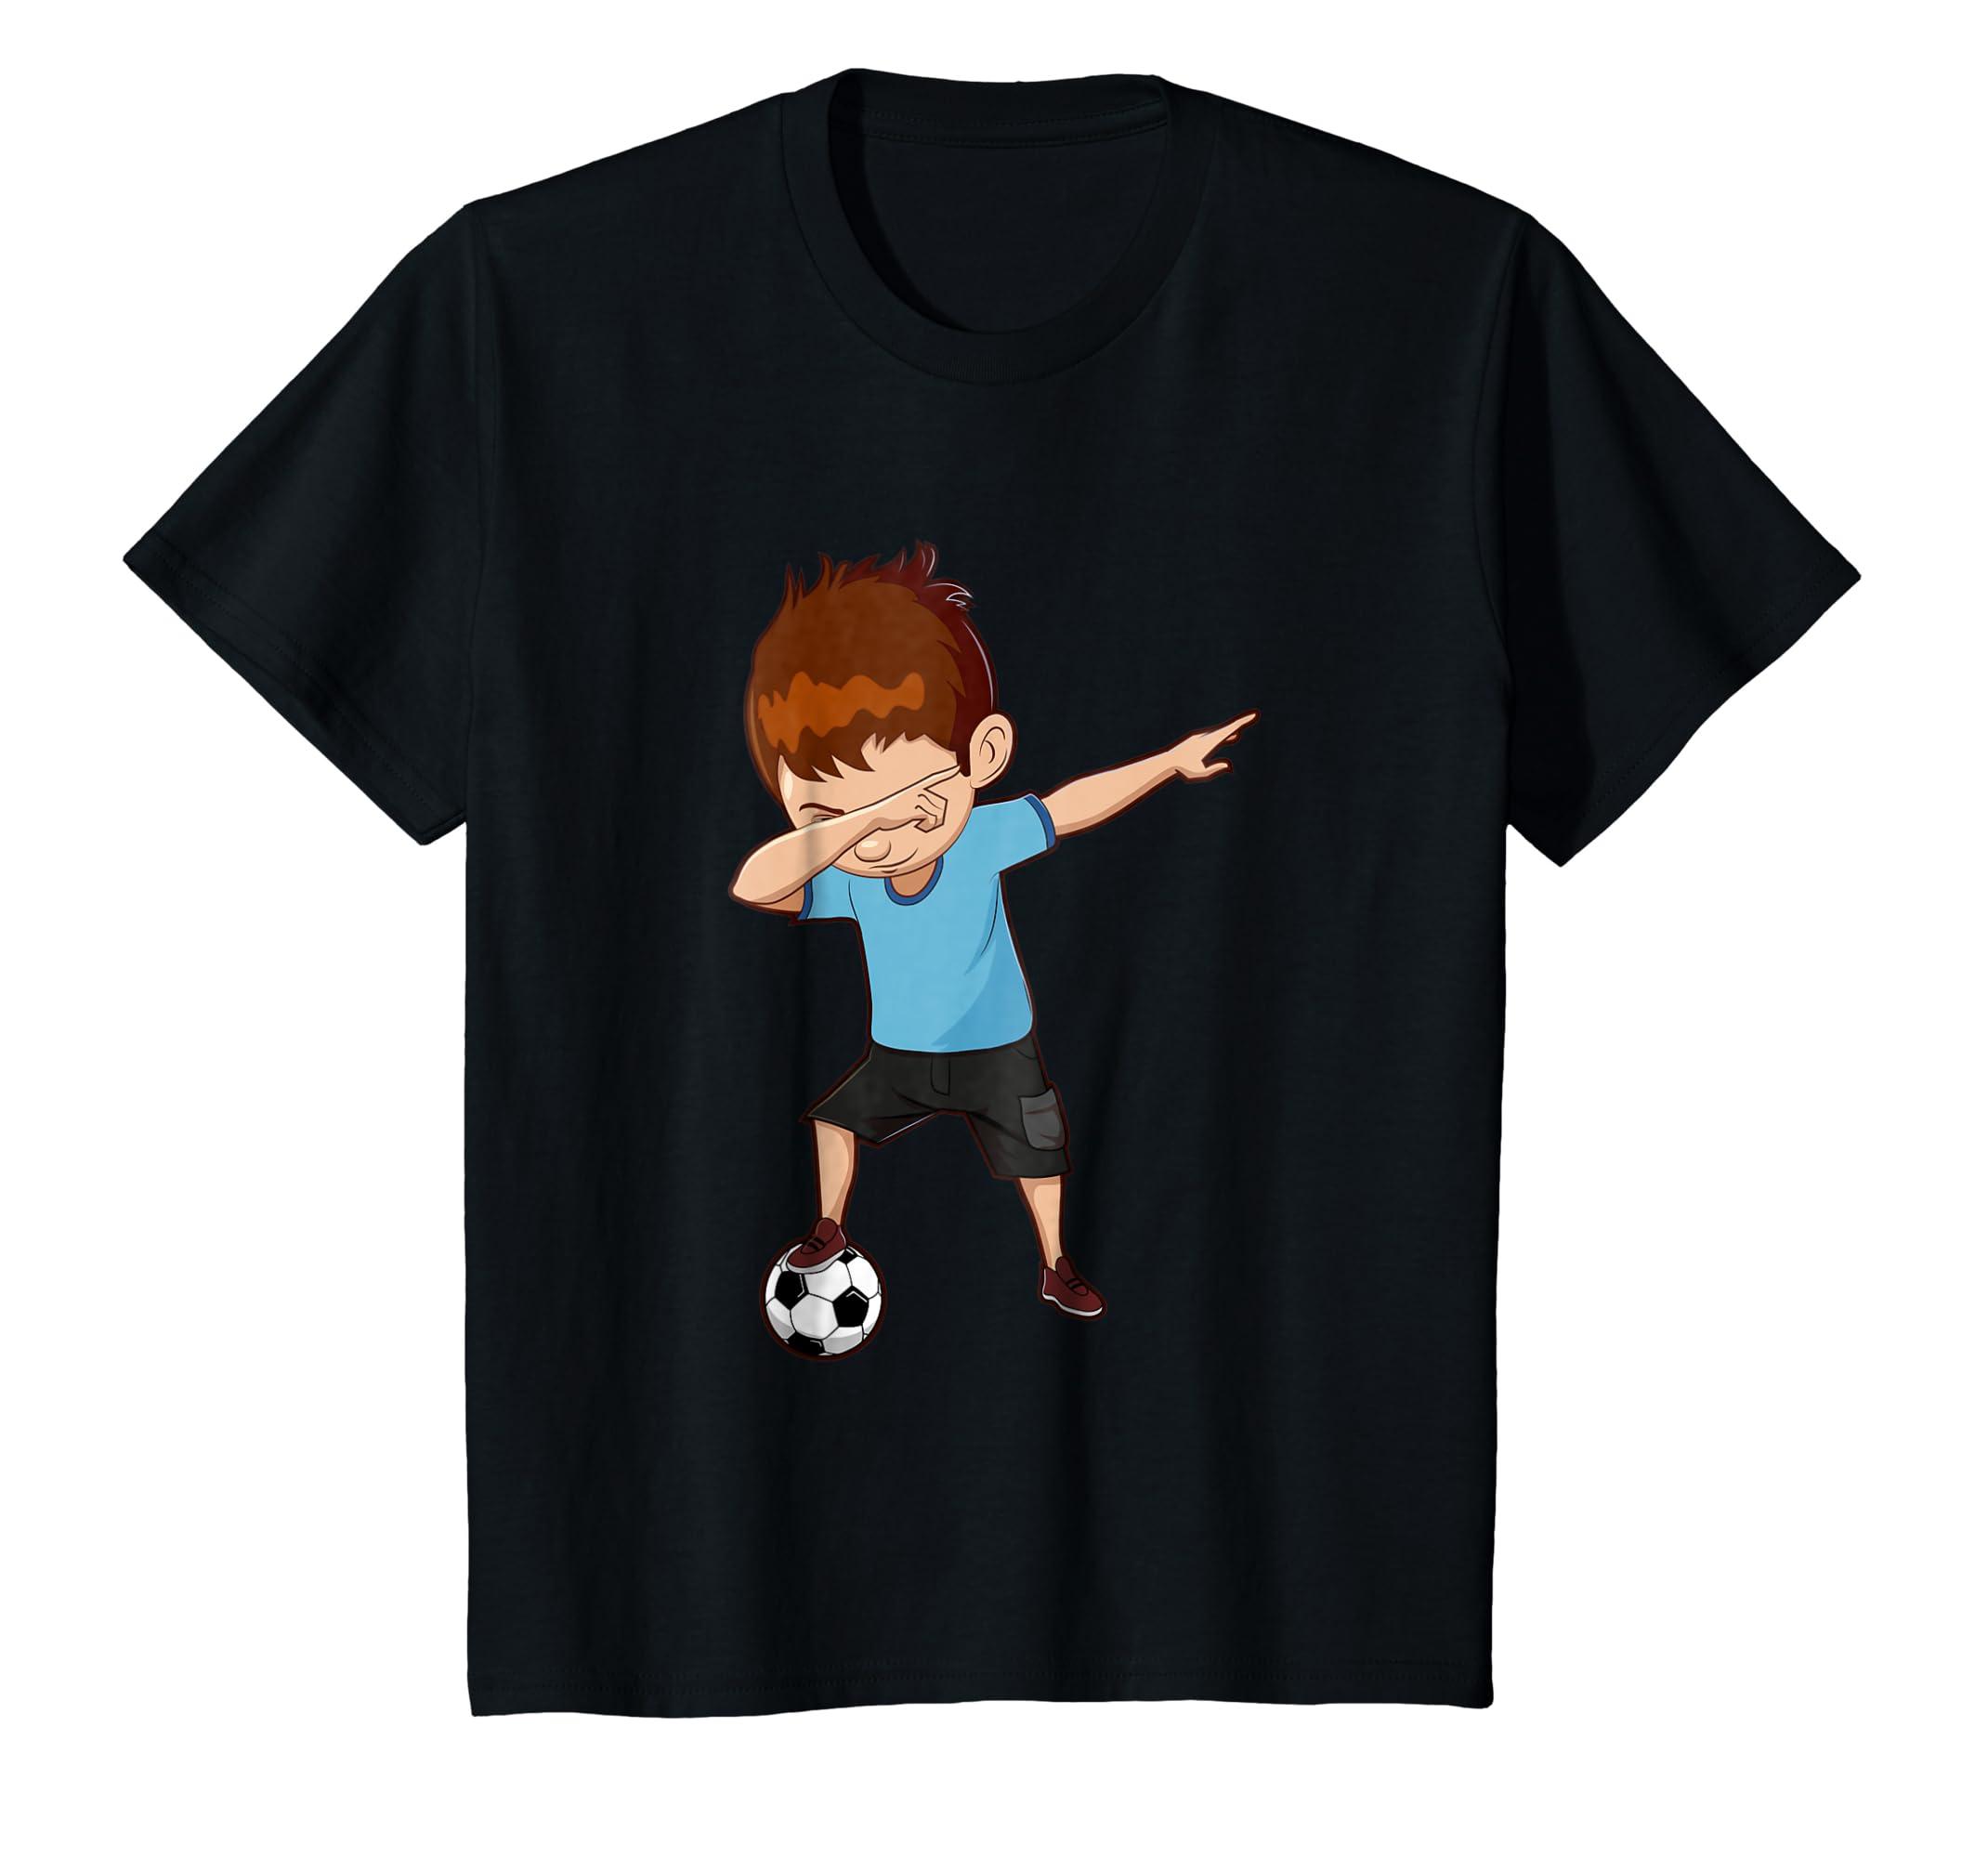 501c4c4fb Amazon.com  Soccer Shirt for Boys Funny Dabbing Tee Youth Toddler Gift   Clothing